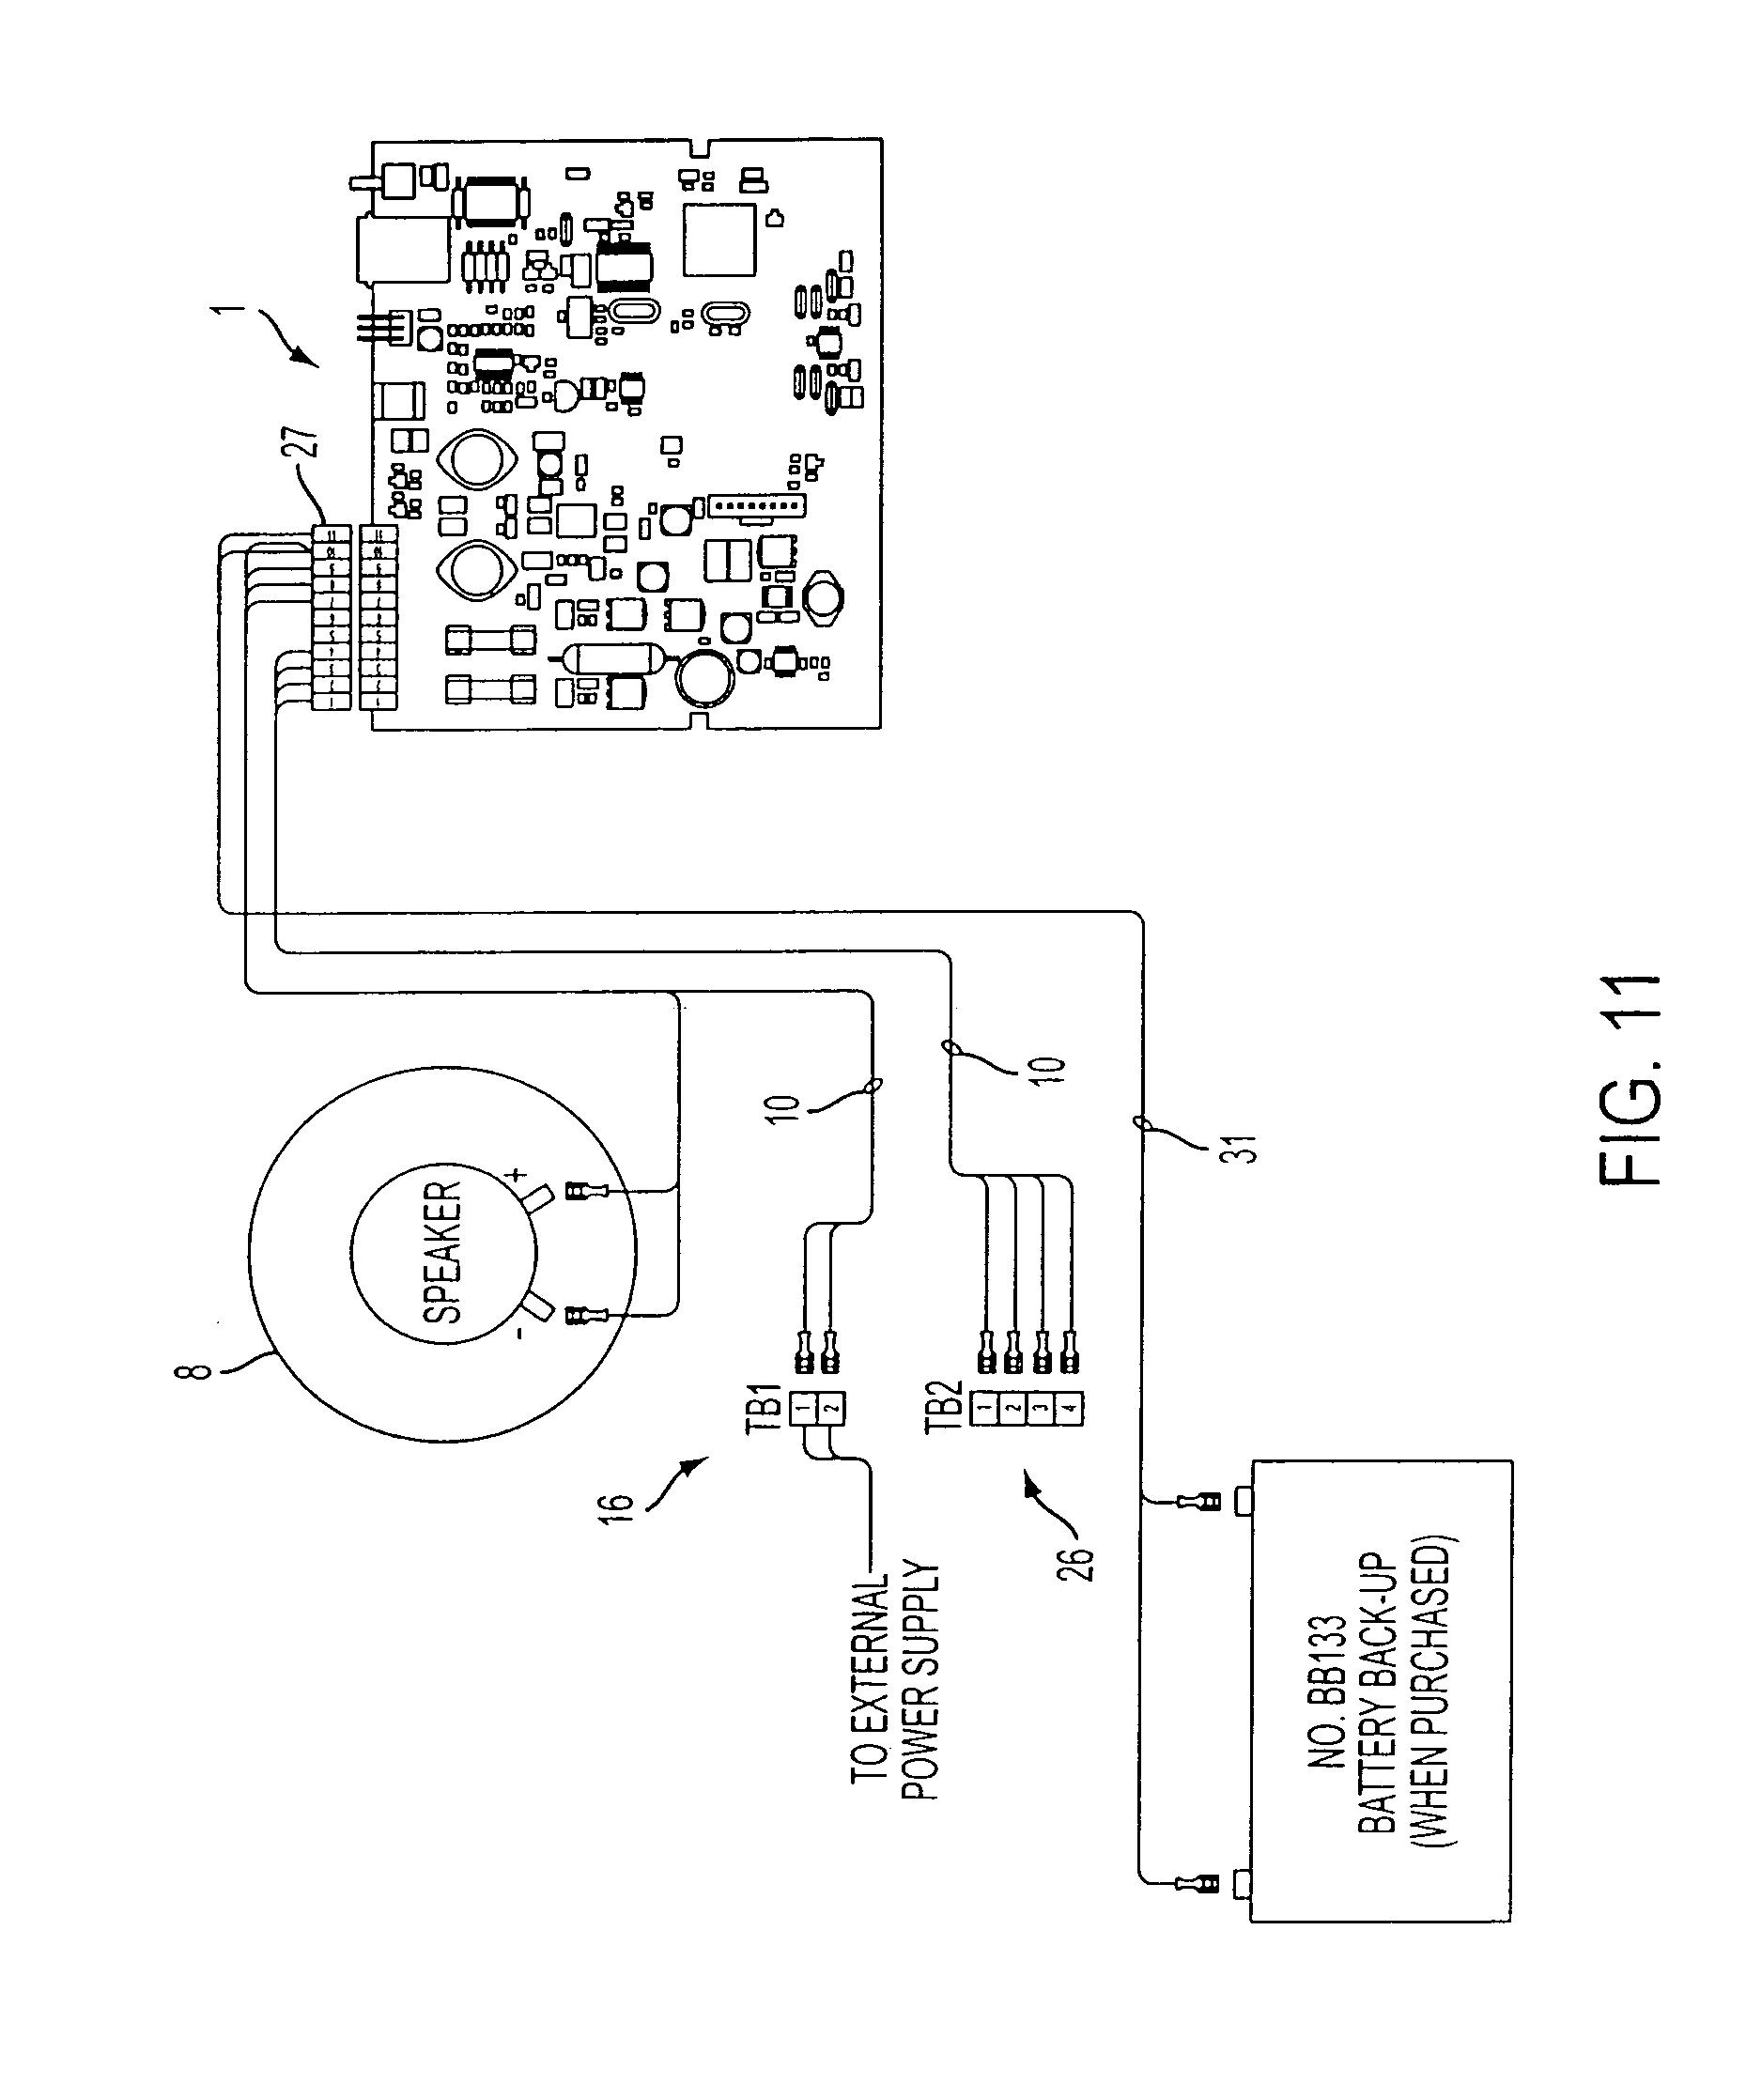 70 volt audio system wiring diagram  diagram  auto wiring